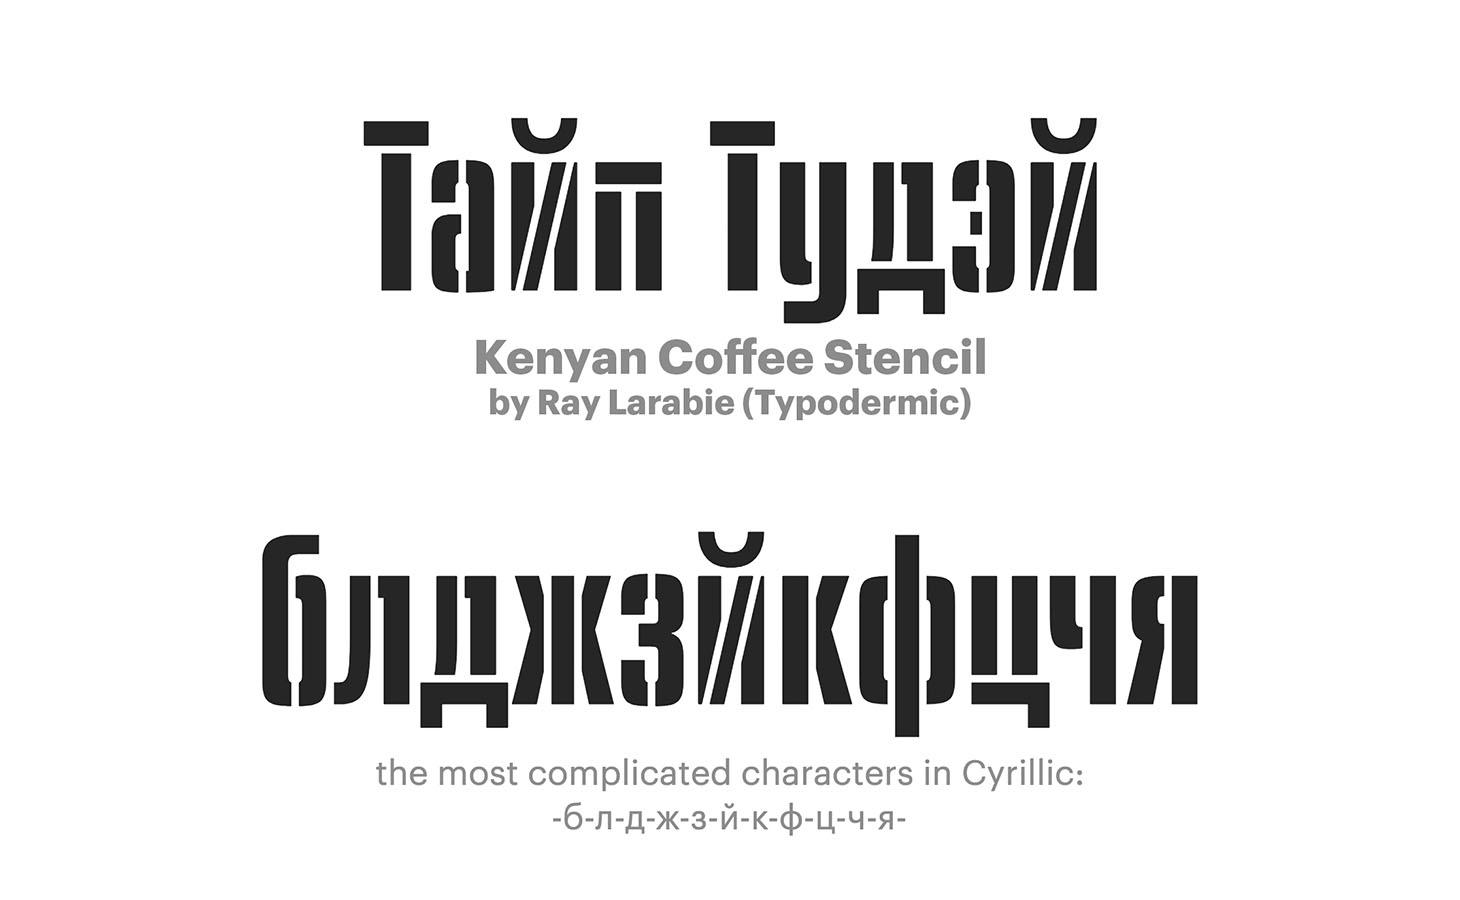 Kenyan-Coffee-Stencil